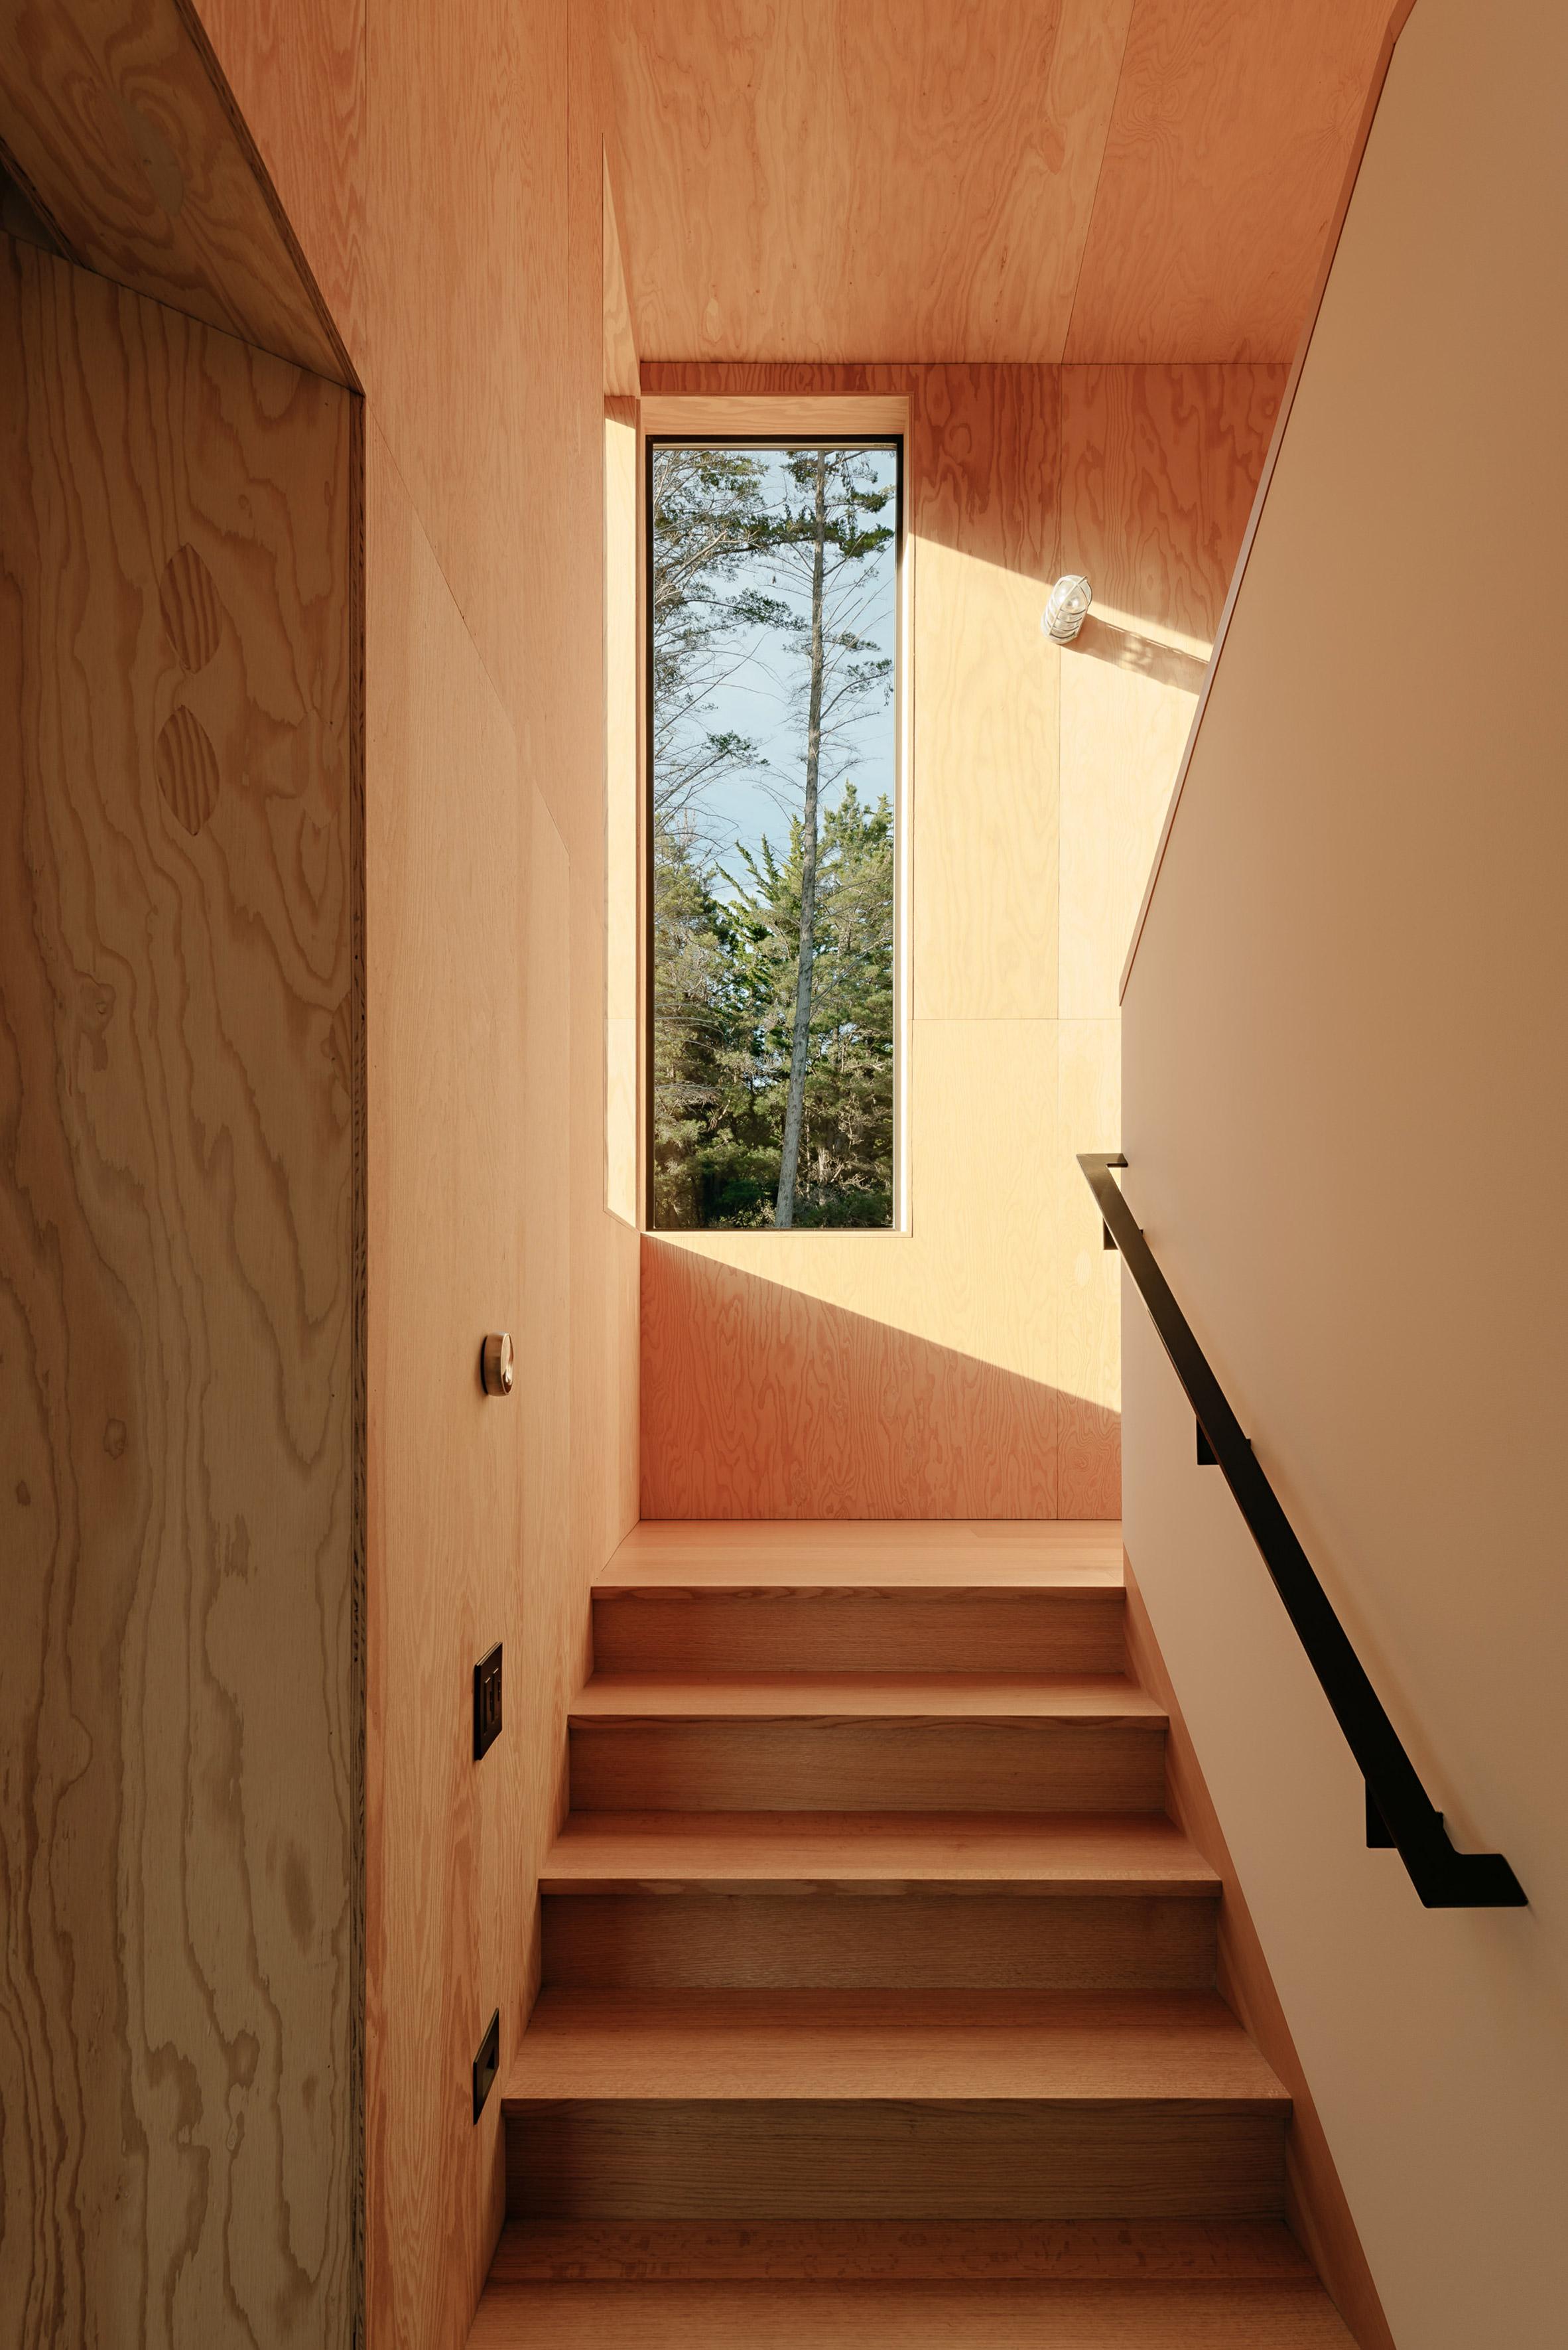 nhà bên biển coastal-retreat-malcolm-davis-architecture-sea-ranch-sonoma-county-califorinia-relaxing-space-elledecoration vn 11